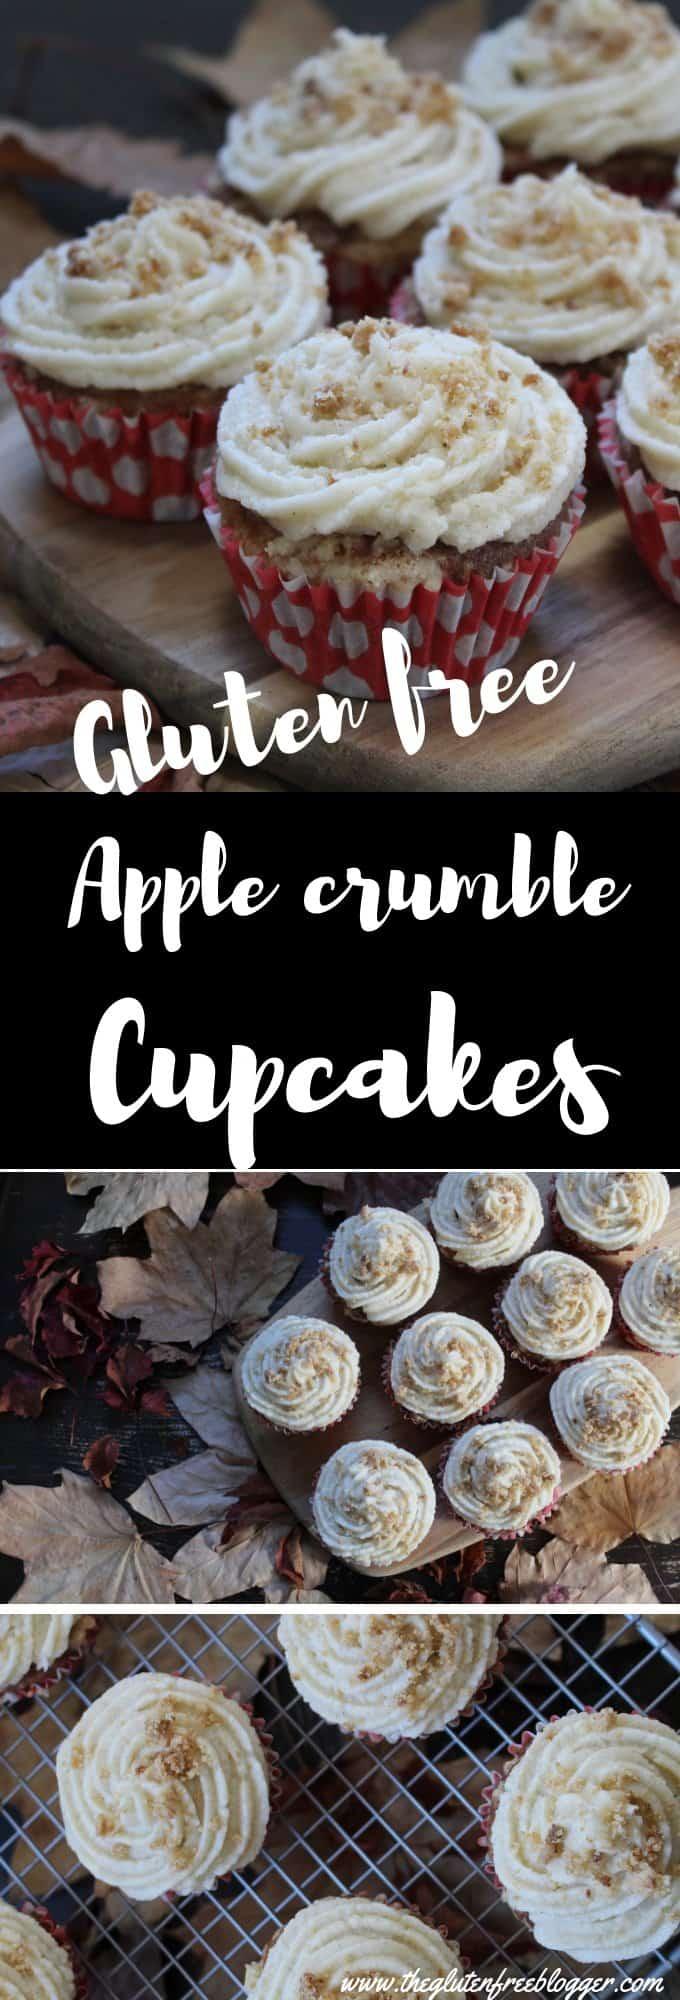 Gluten free apple crumble cupcakes recipe - coeliac - gluten free recipe - cupcakes - frosting - buttercream